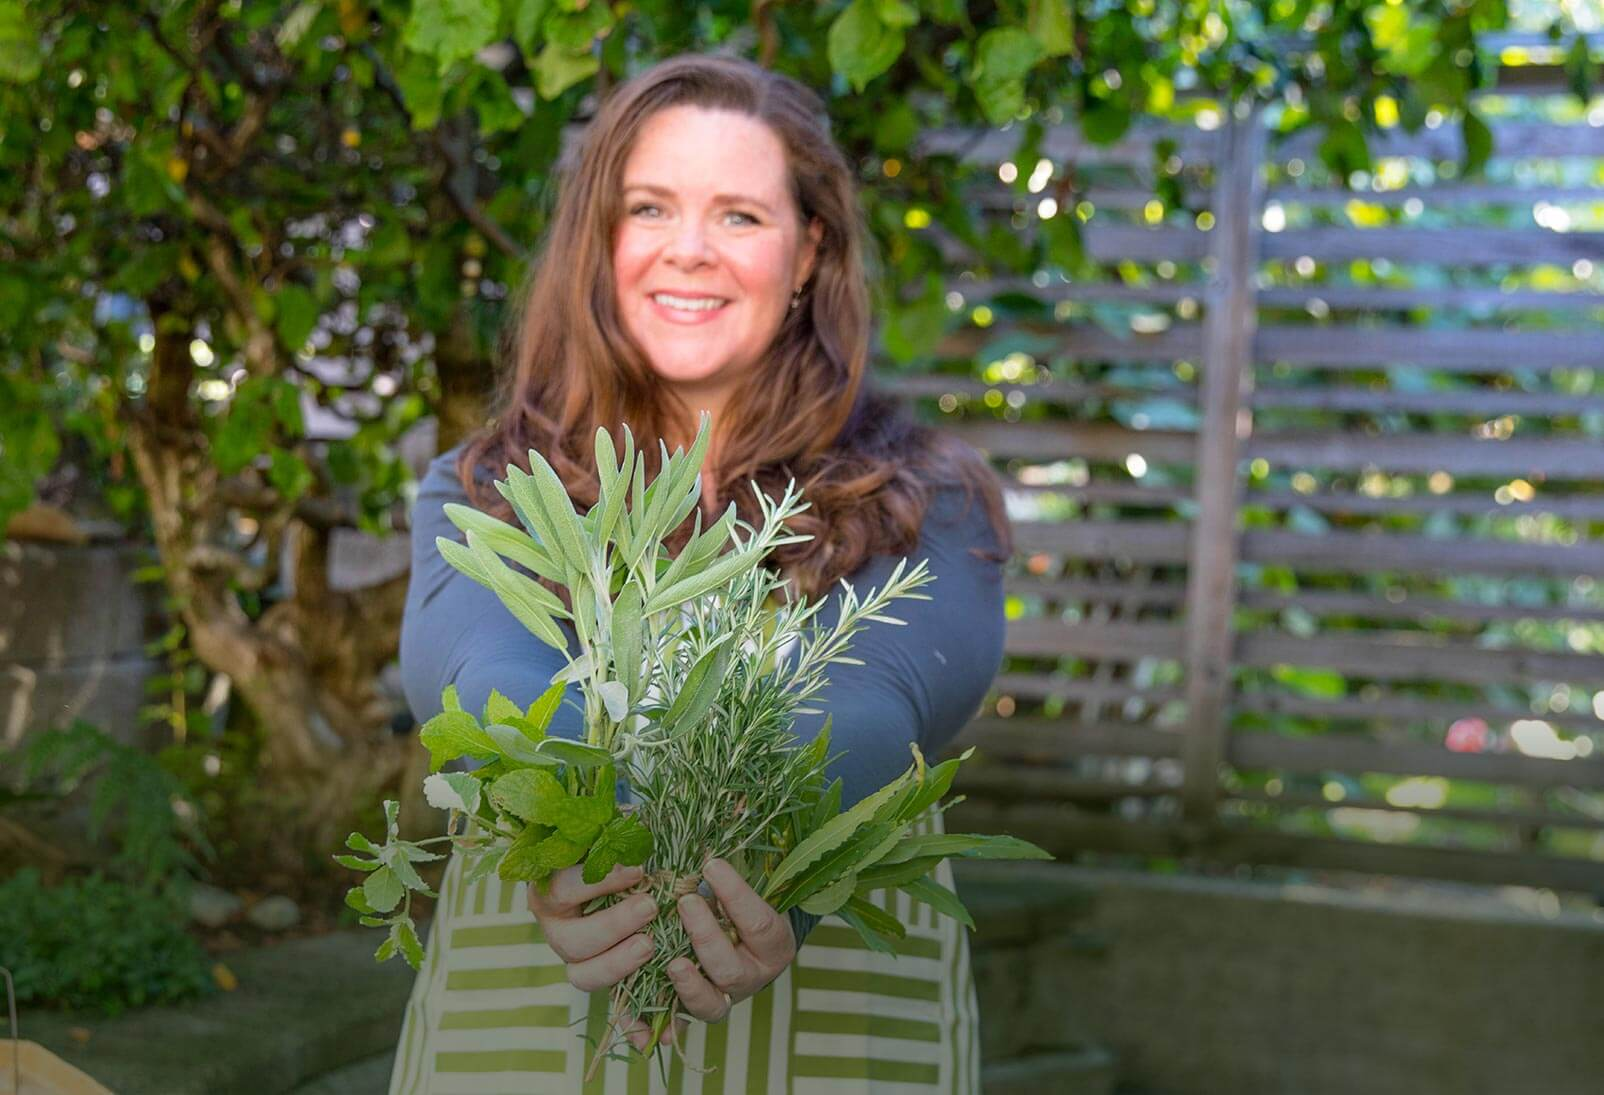 Stephanie Rose holding herbs